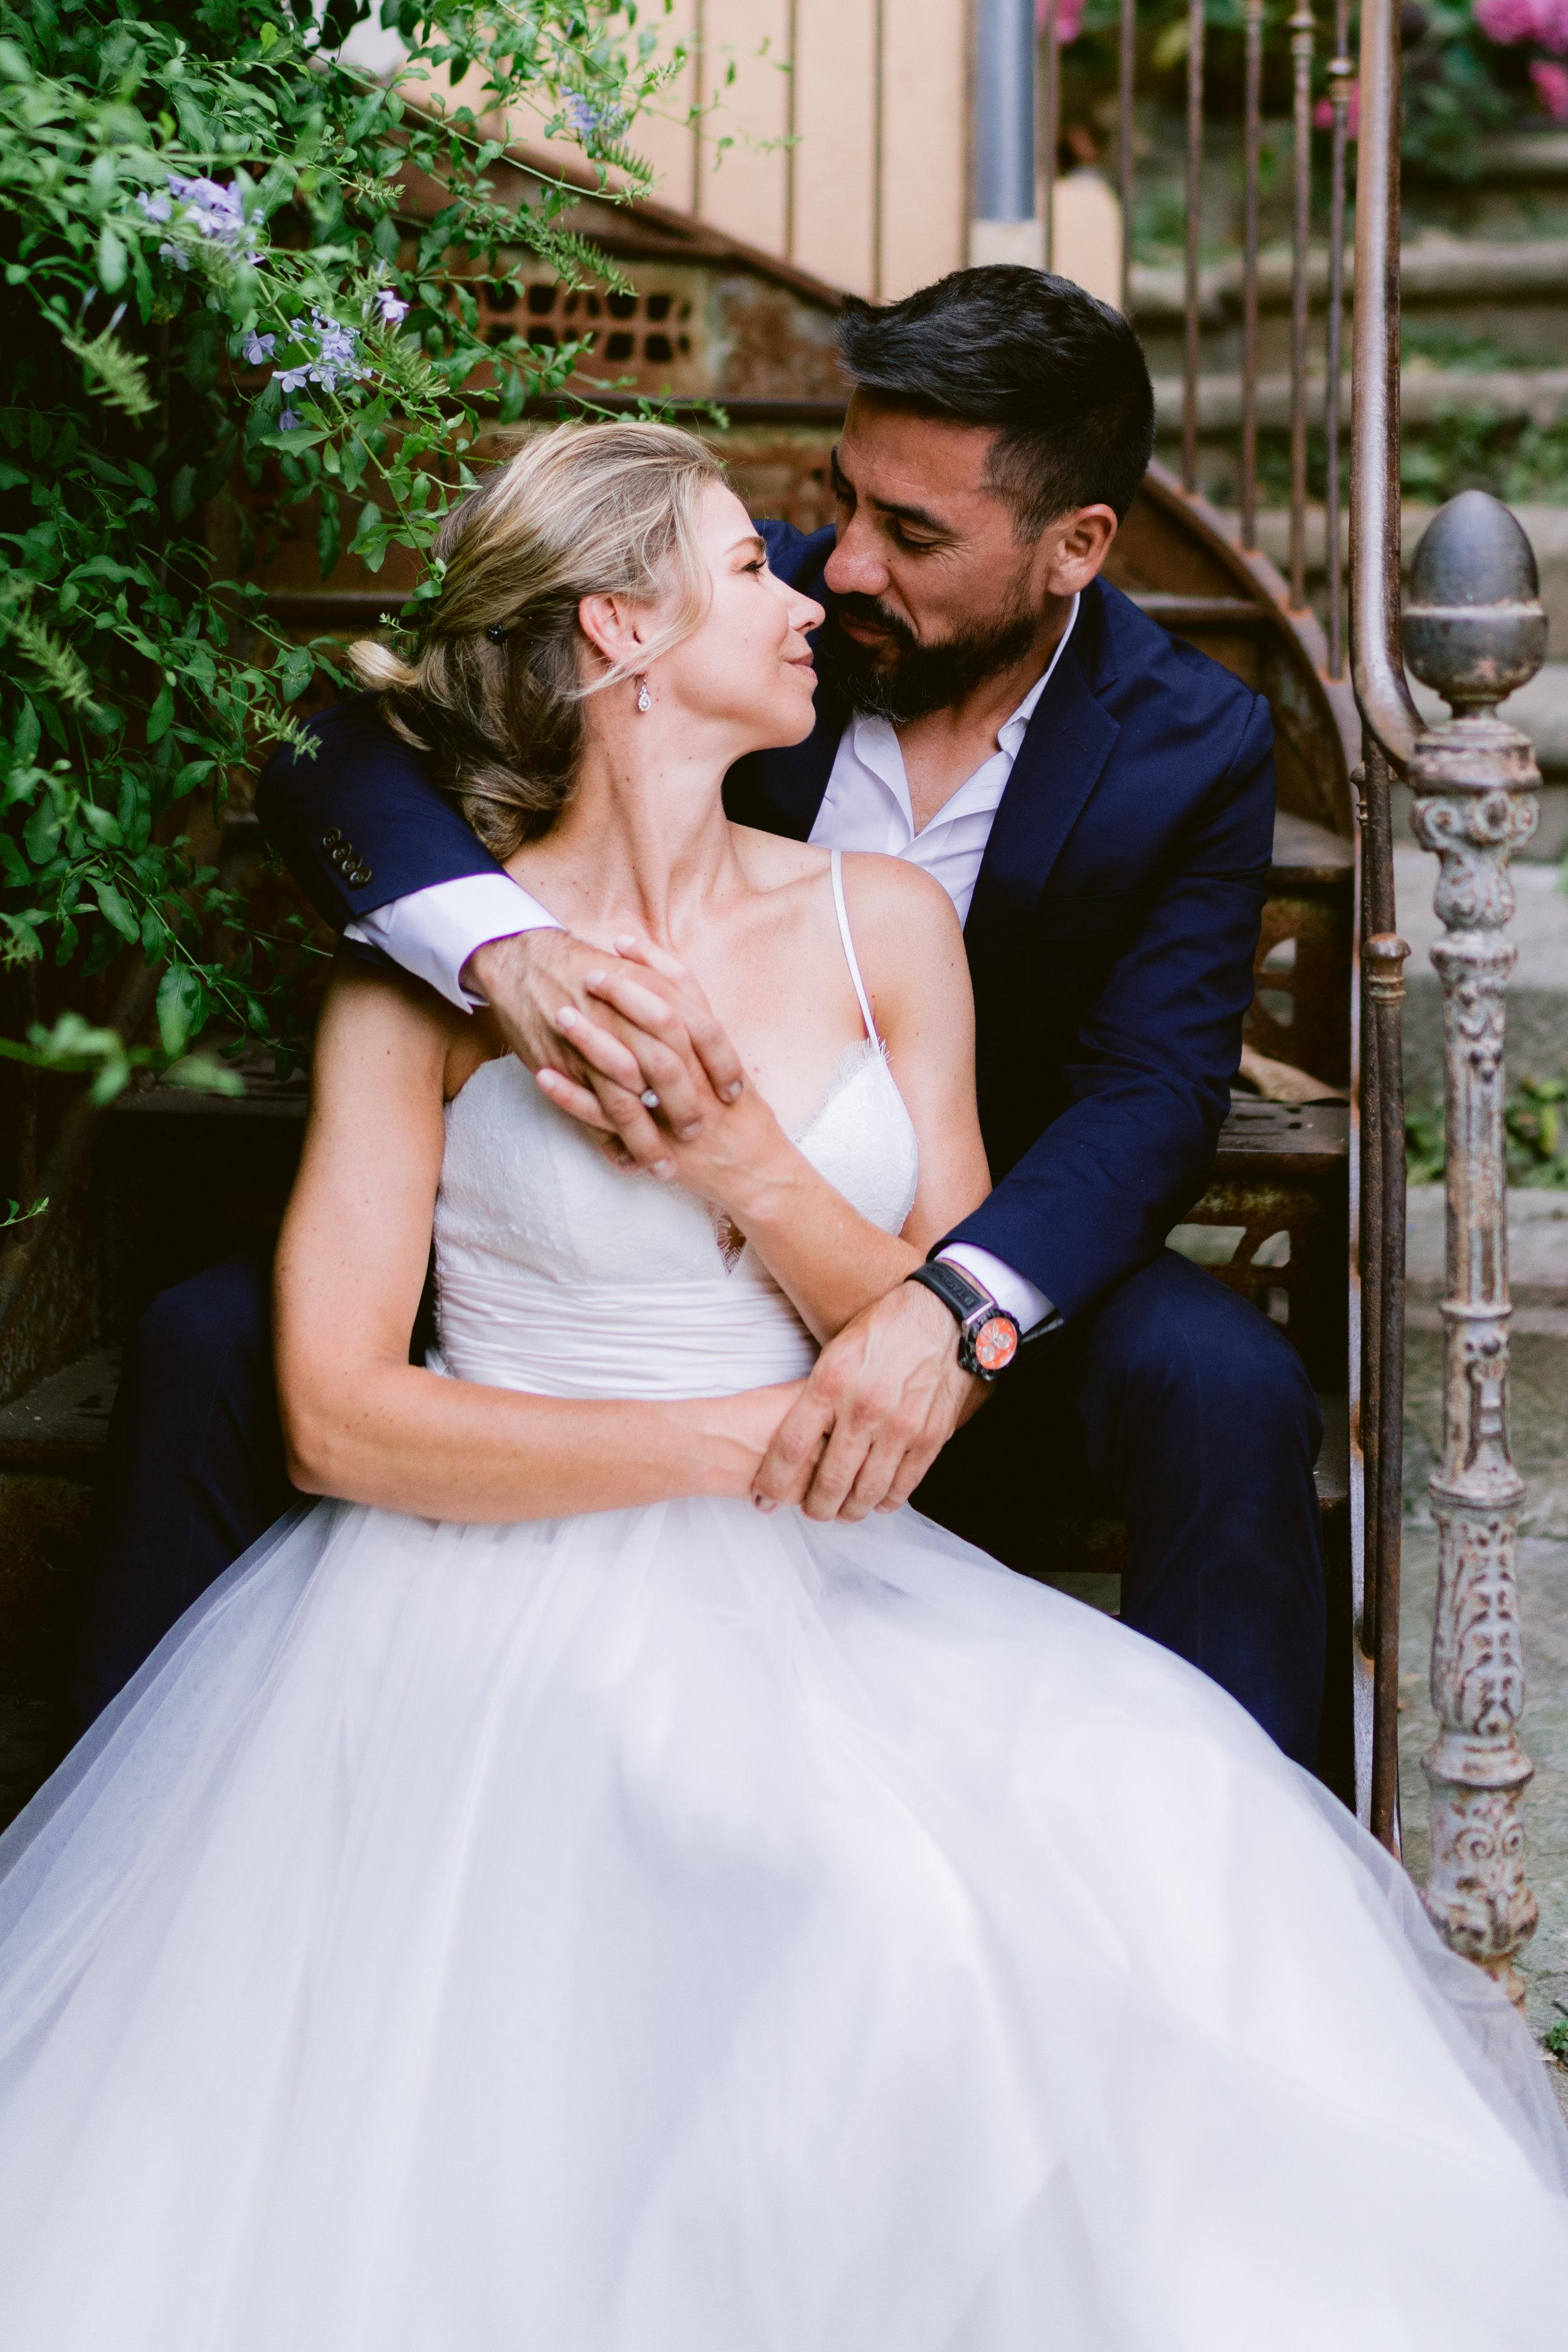 english photographer in france, wedding photographer saint tropez, romantic wedding photography france, chateau wedding france, cote d'azur wedding photographer, ramatuelle wedding (14).jpg